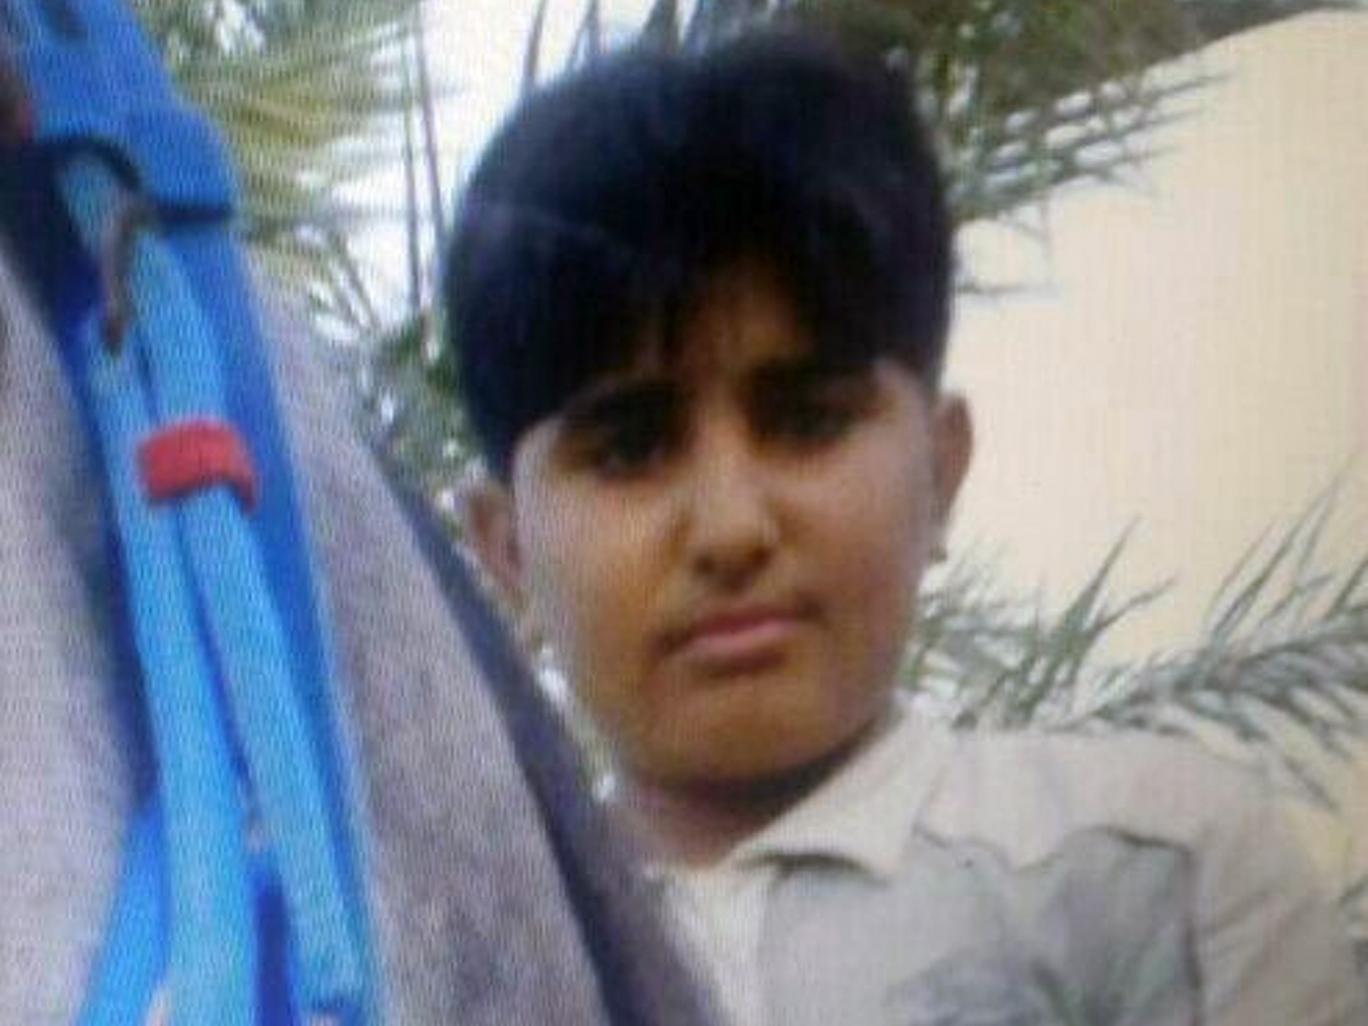 Saudi teen looks